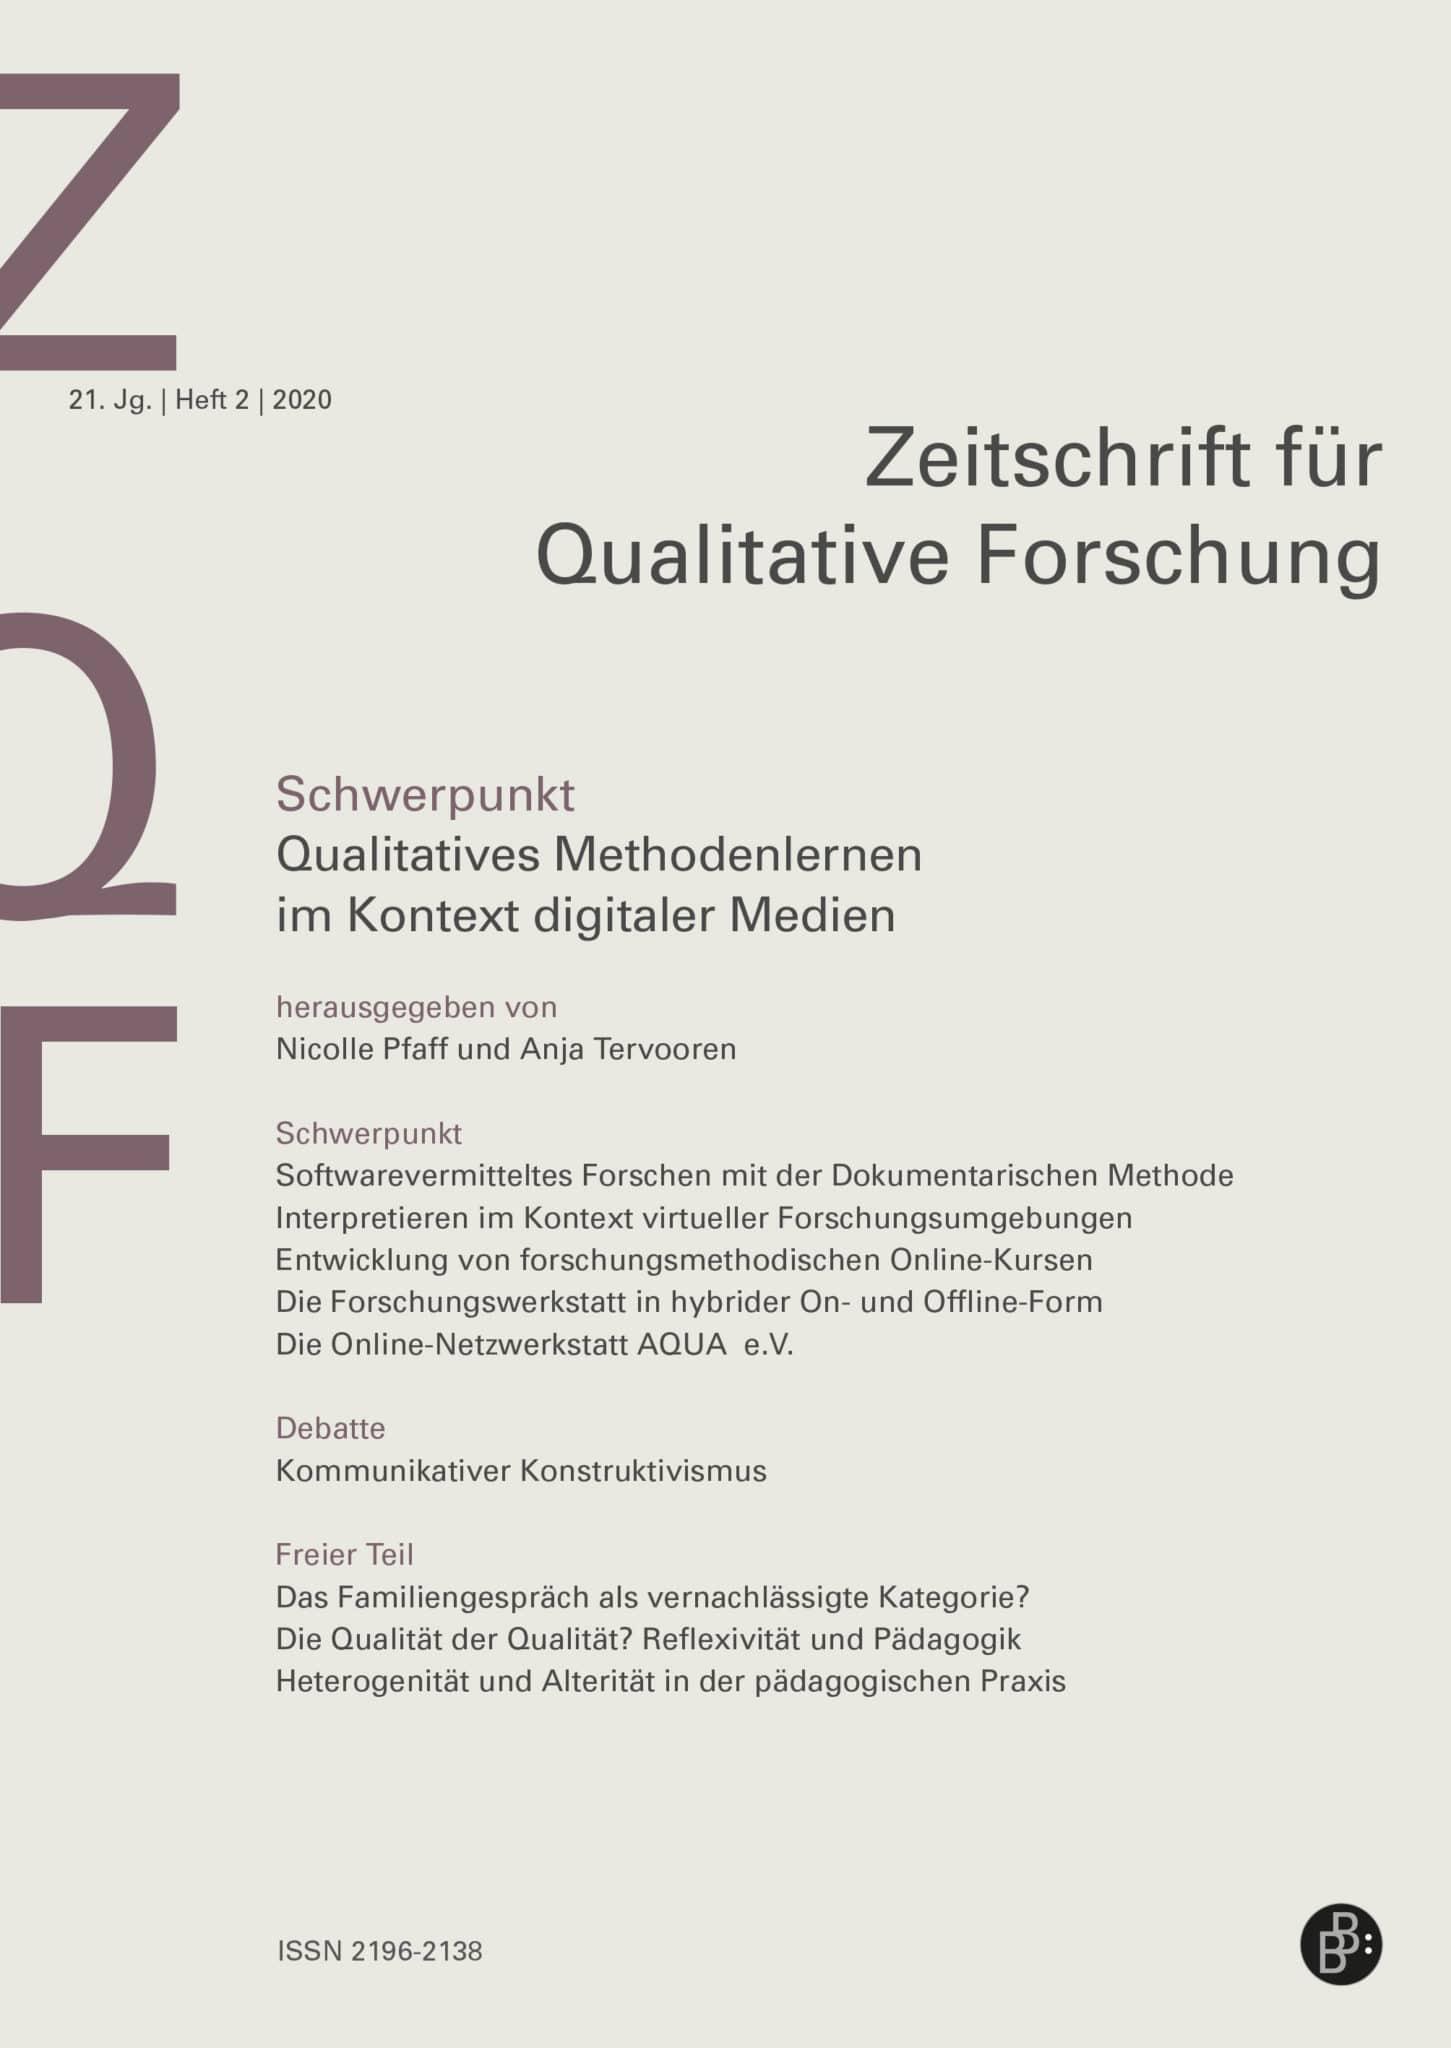 ZQF – Zeitschrift für Qualitative Forschung 2-2020: Qualitatives Methodenlernen im Kontext digitaler Medien